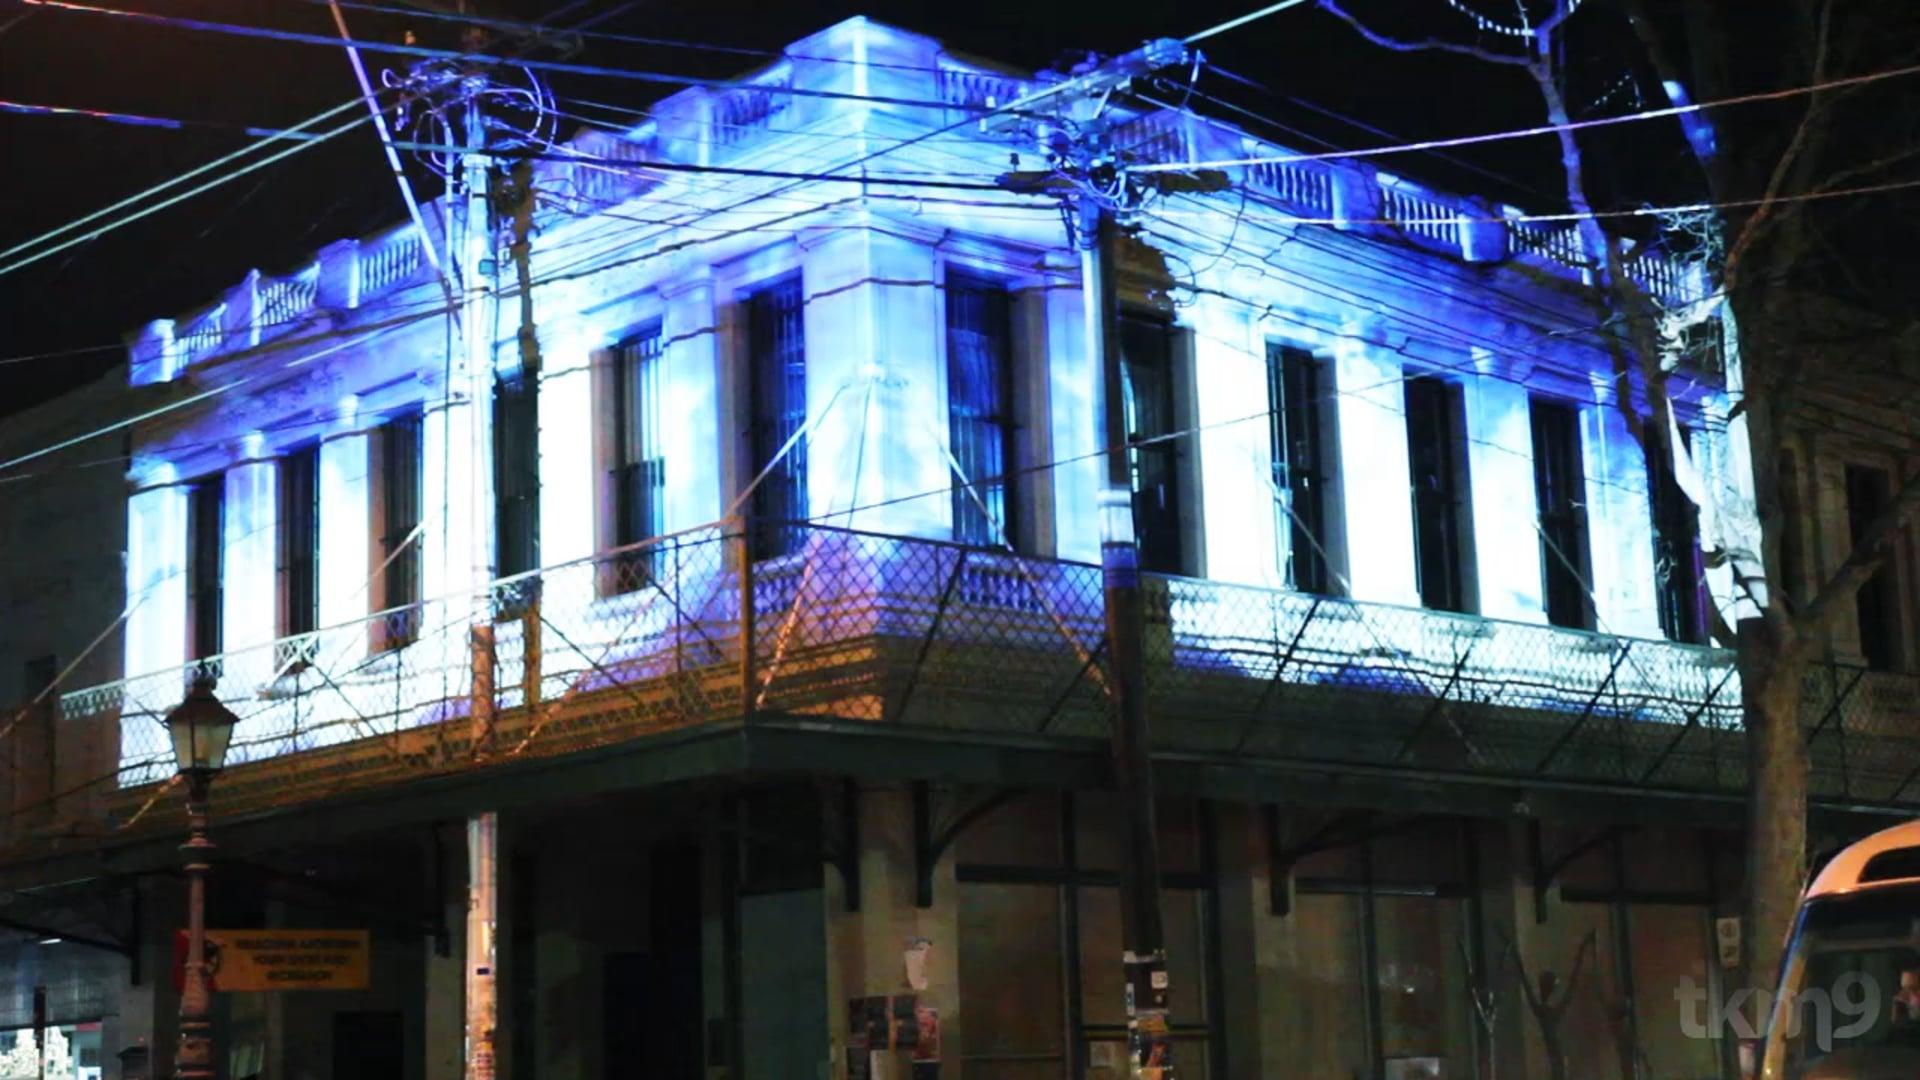 TKM9 | The Gertrude St Light Festival.